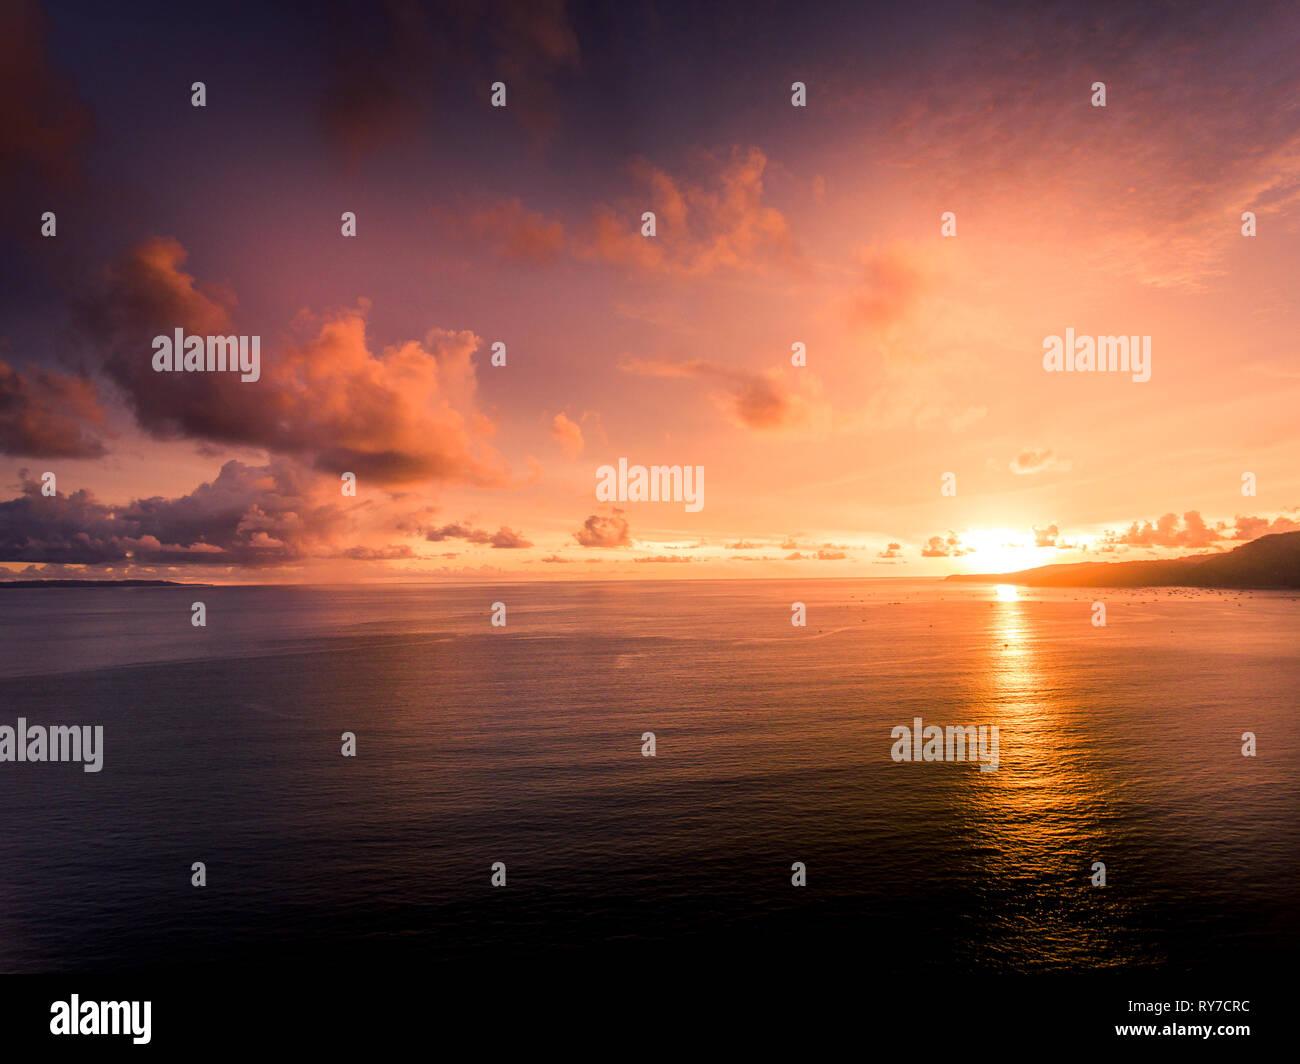 Beautiful sunset in Cisolok, Pelabuhan Ratu, West Java - Stock Image